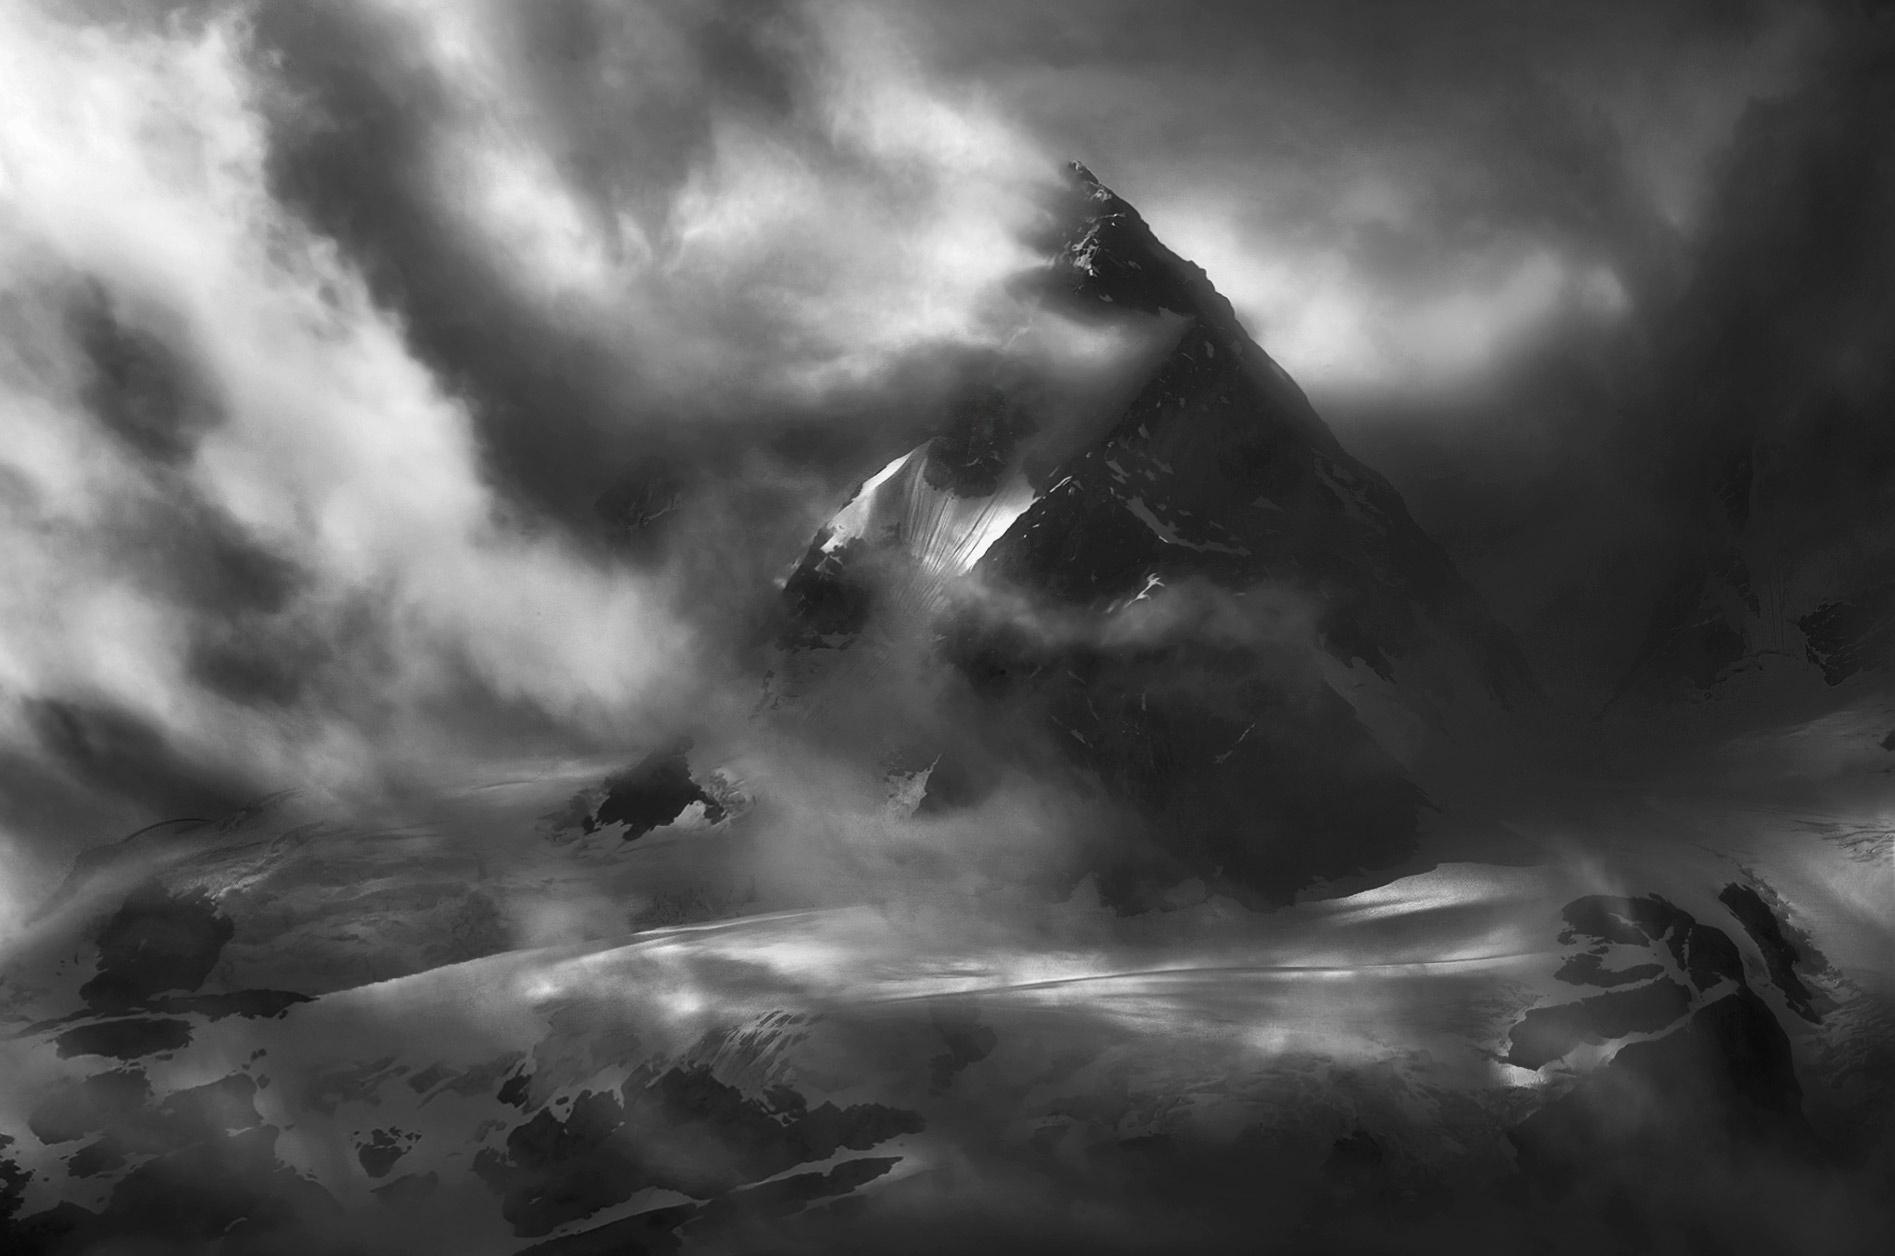 mountains, dramatic, storm, glacier, peaks, summit, british columbia, alaska, photo